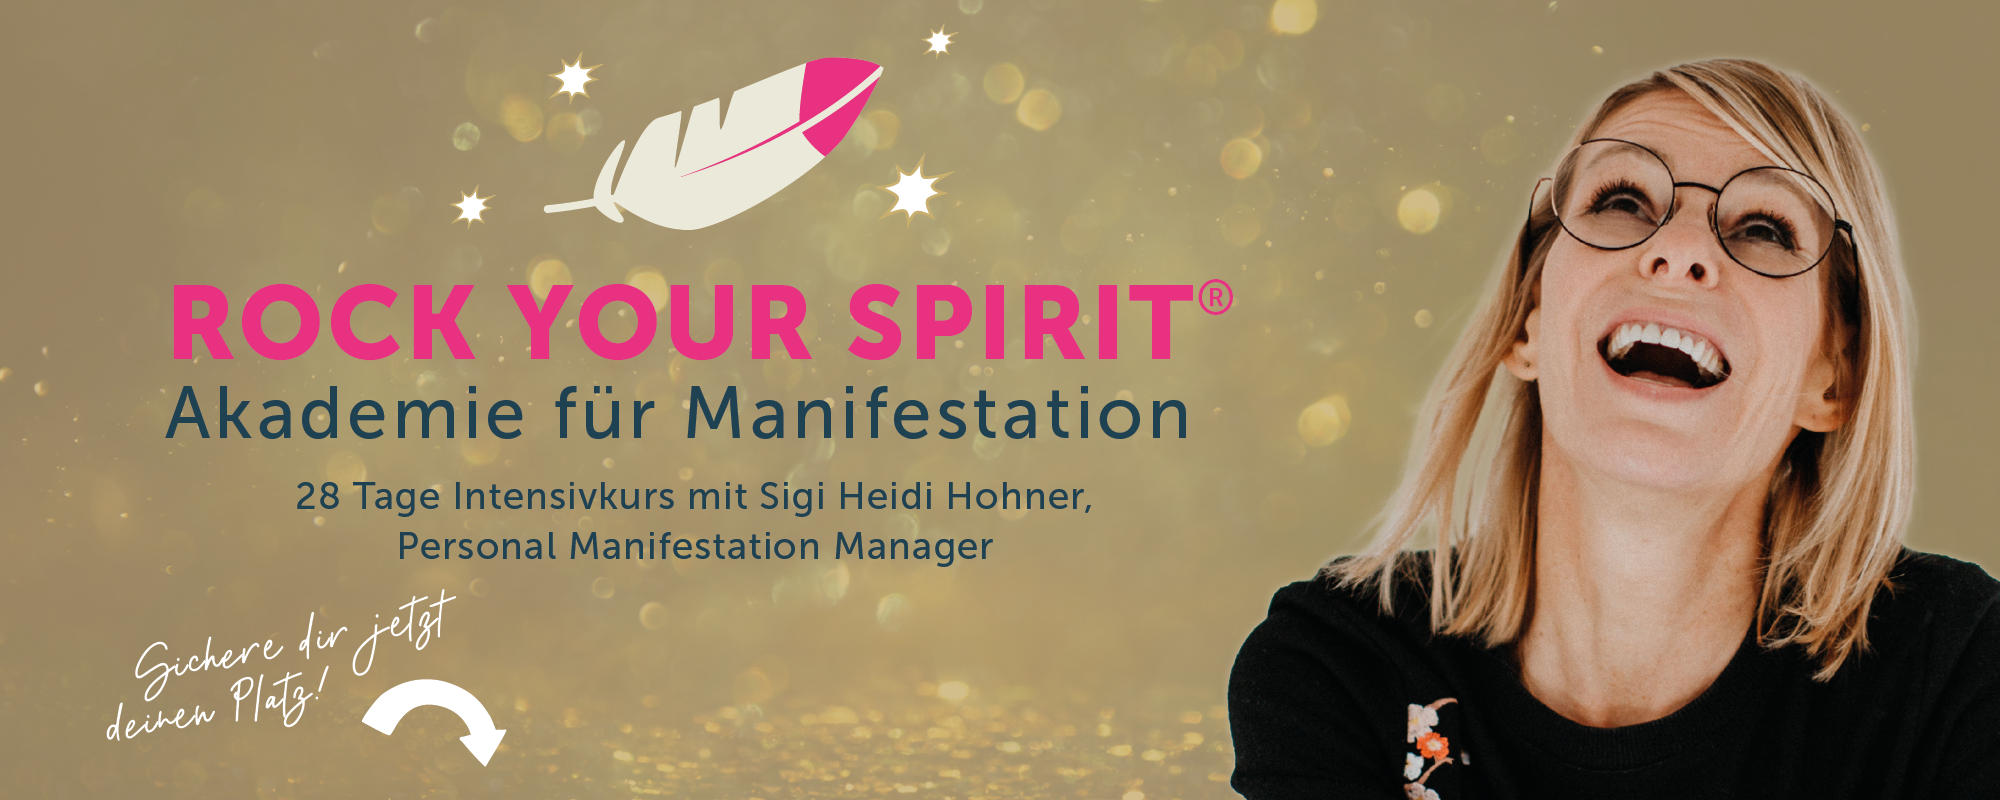 Rock your spirit